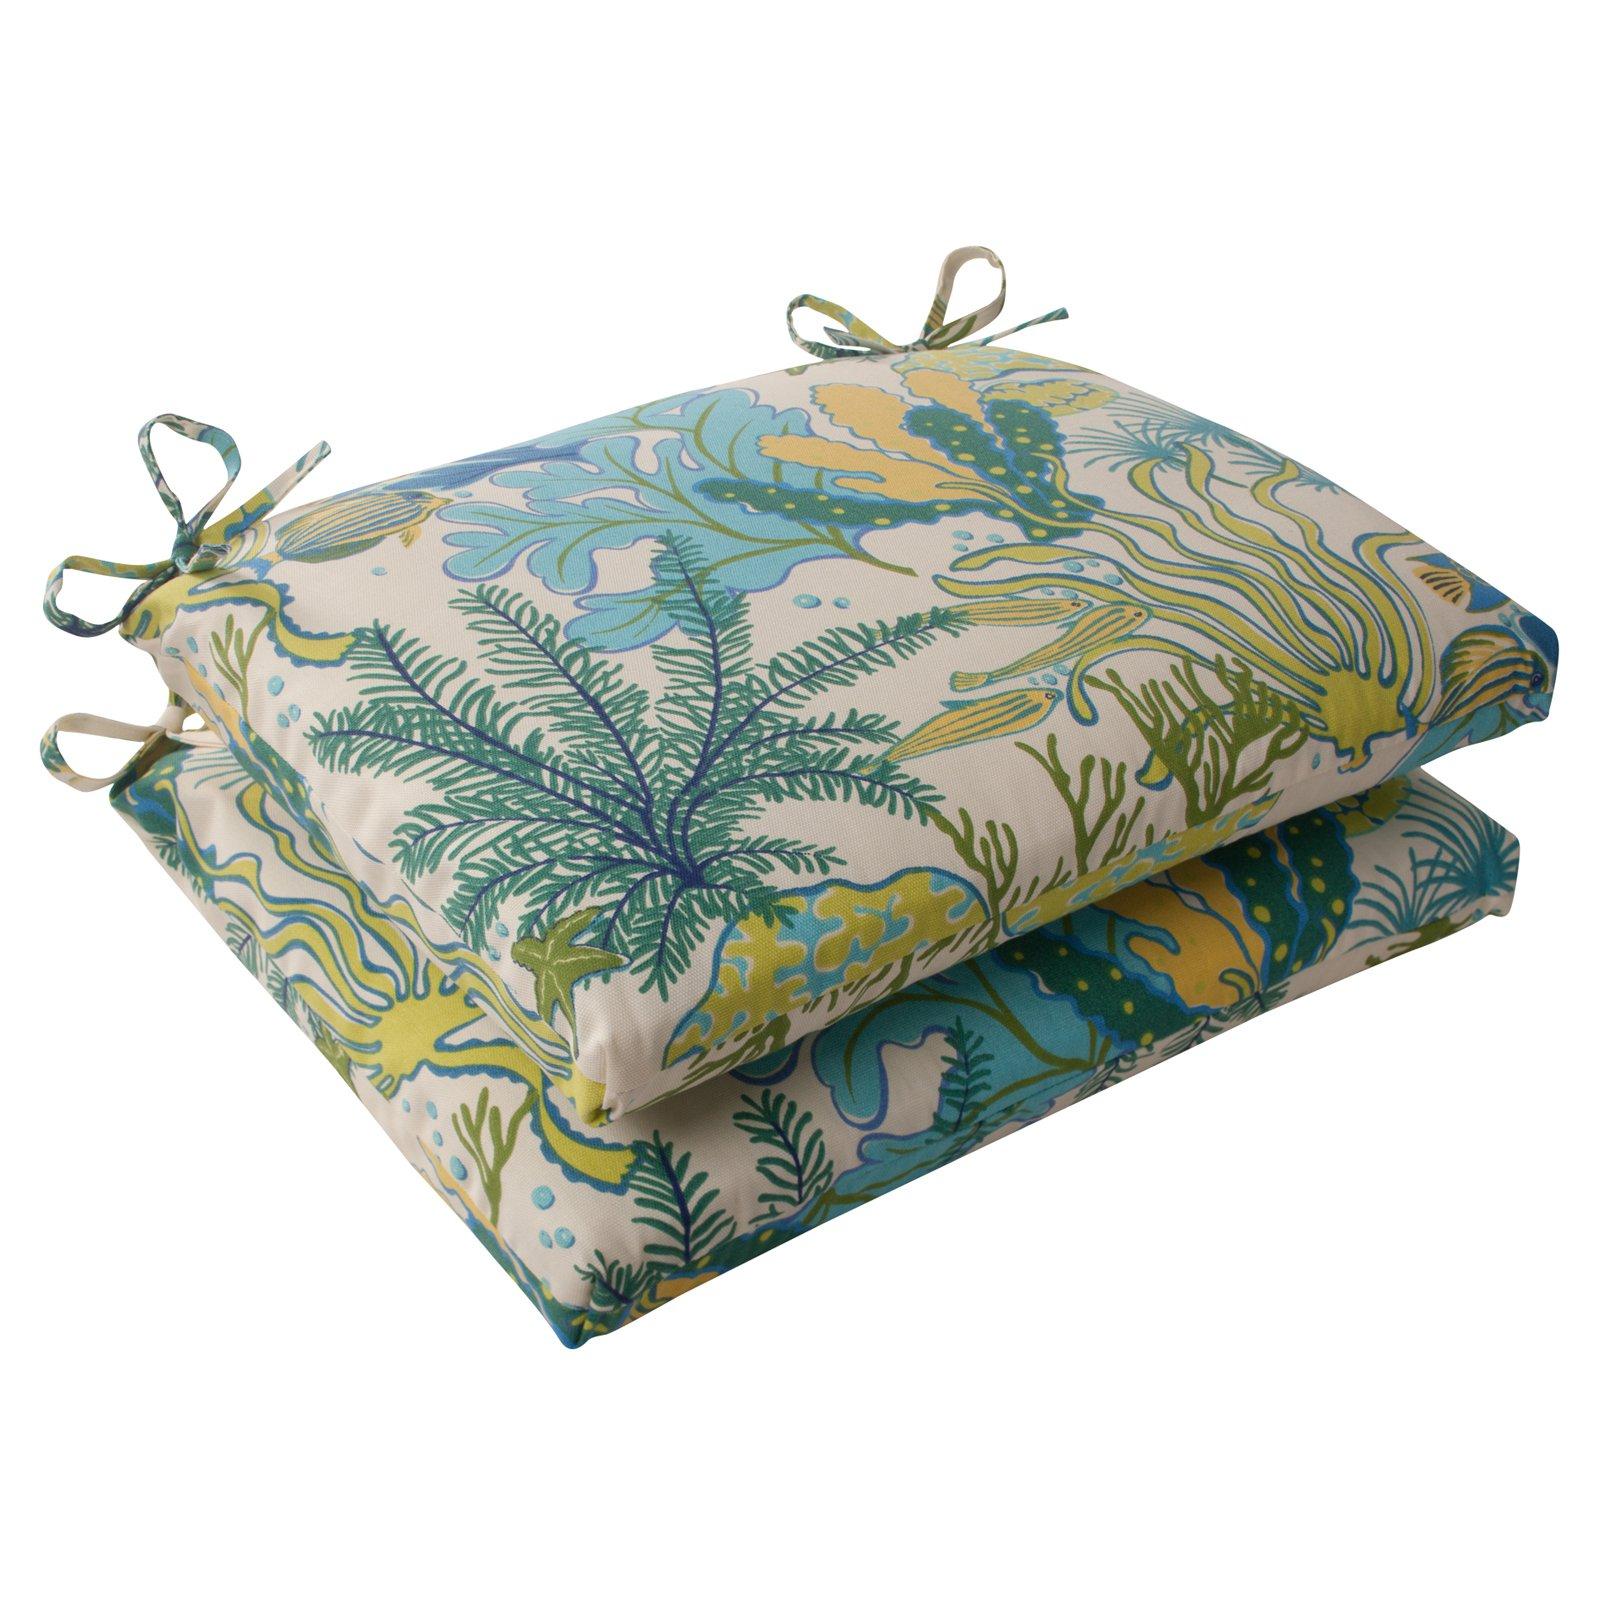 Pillow Perfect Outdoor/ Indoor Splish Splash Blue Squared Corners Seat Cushion (Set